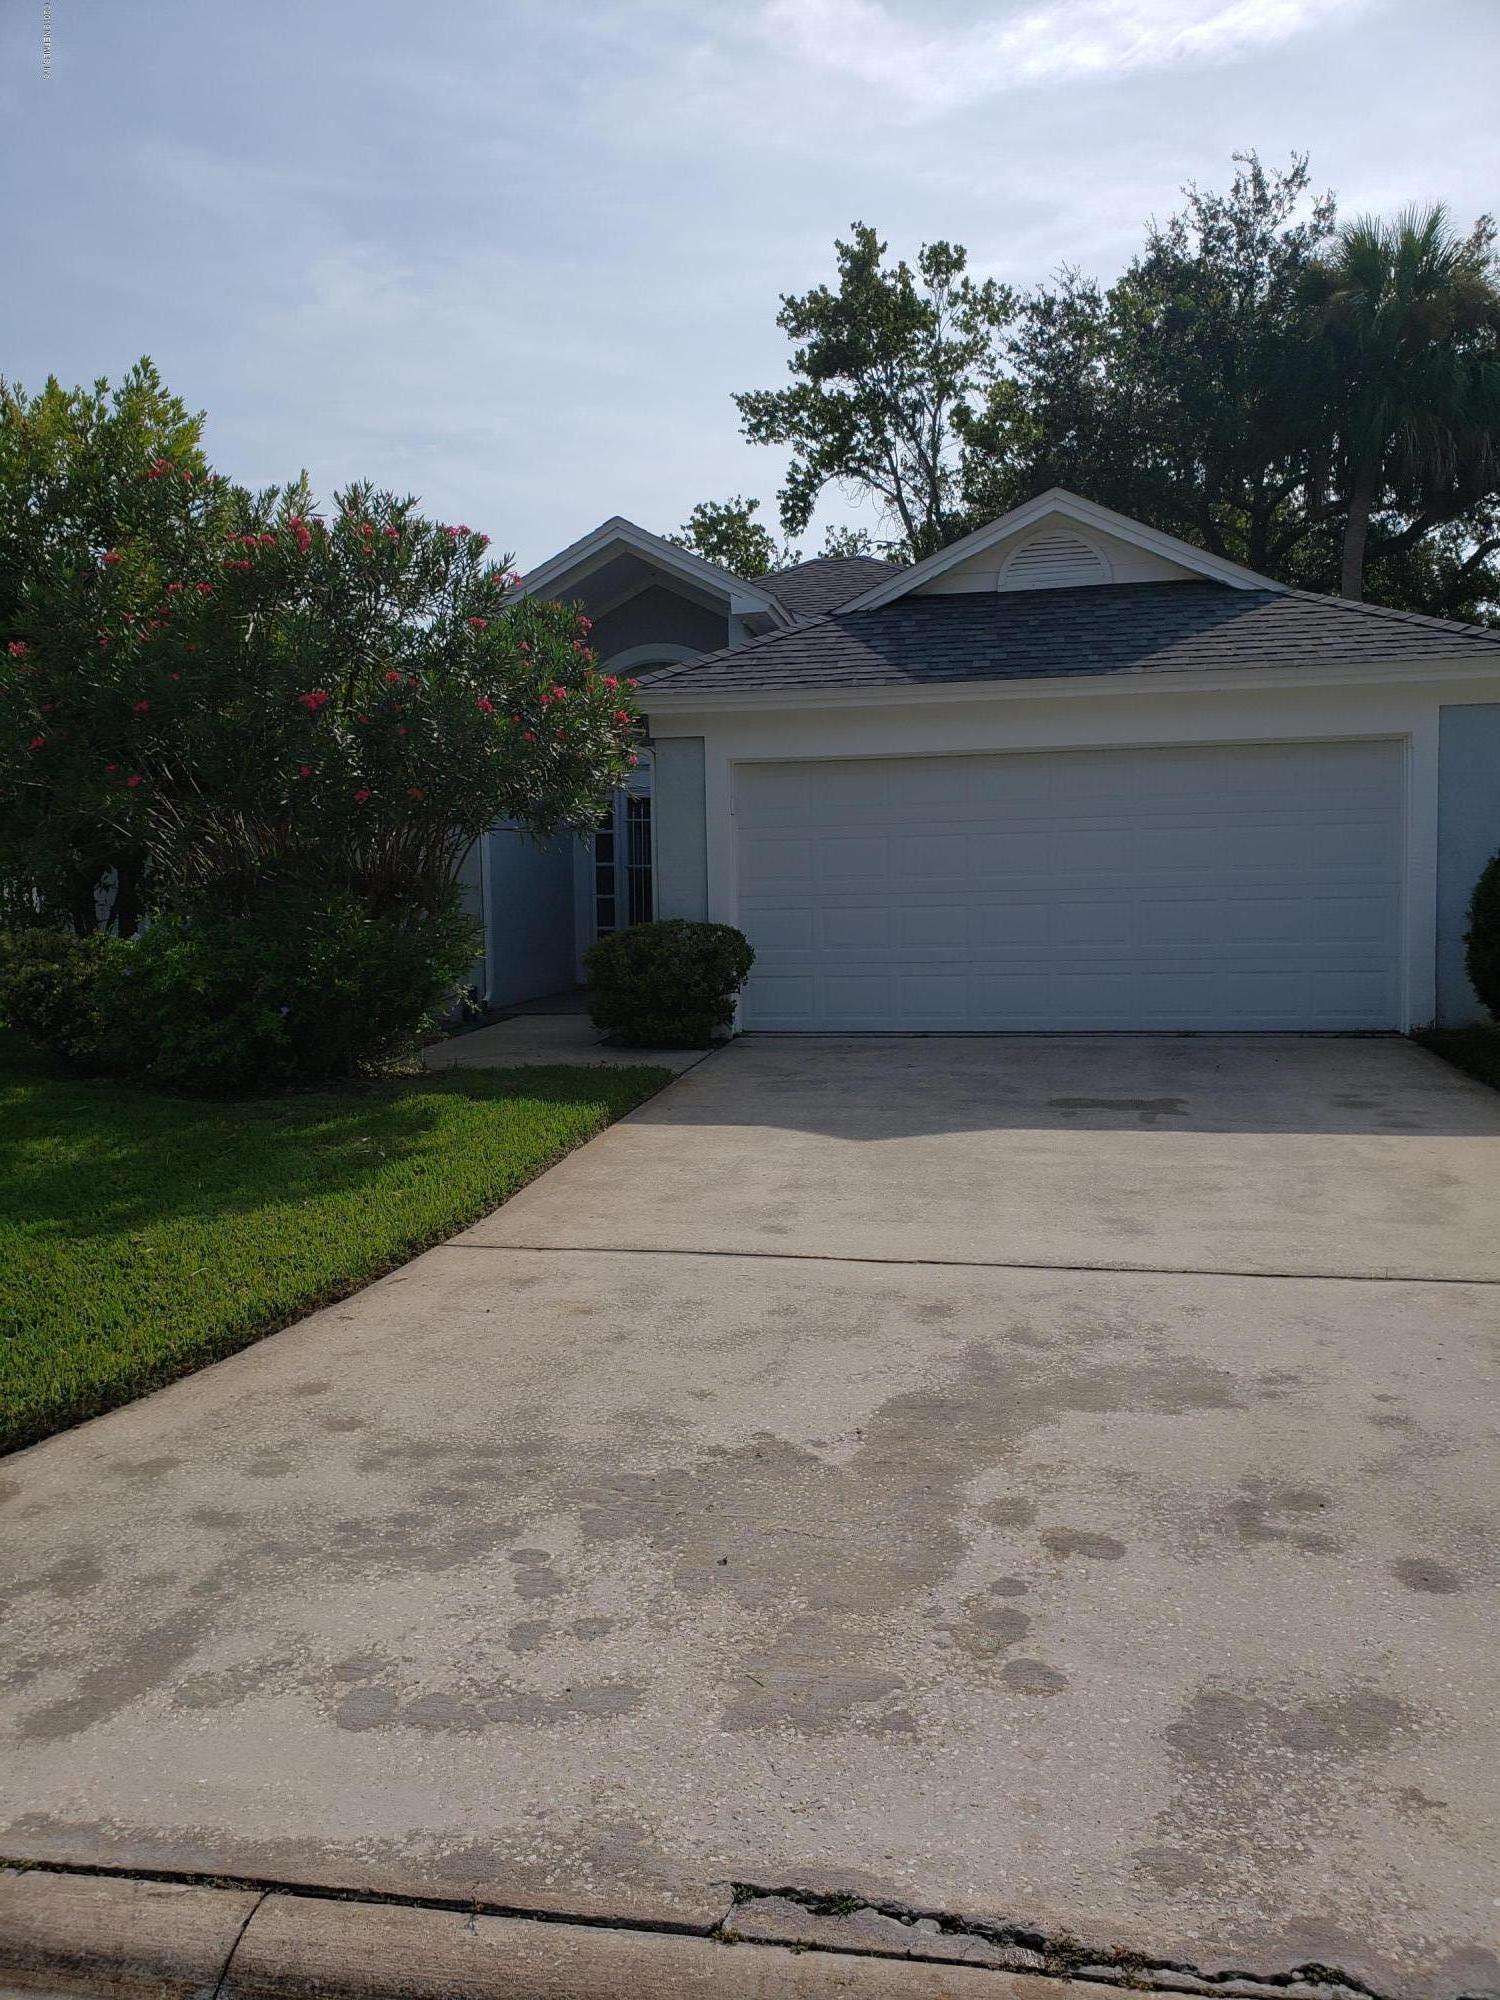 1181 LINKSIDE, ATLANTIC BEACH, FLORIDA 32233, 3 Bedrooms Bedrooms, ,2 BathroomsBathrooms,Residential - single family,For sale,LINKSIDE,1010019